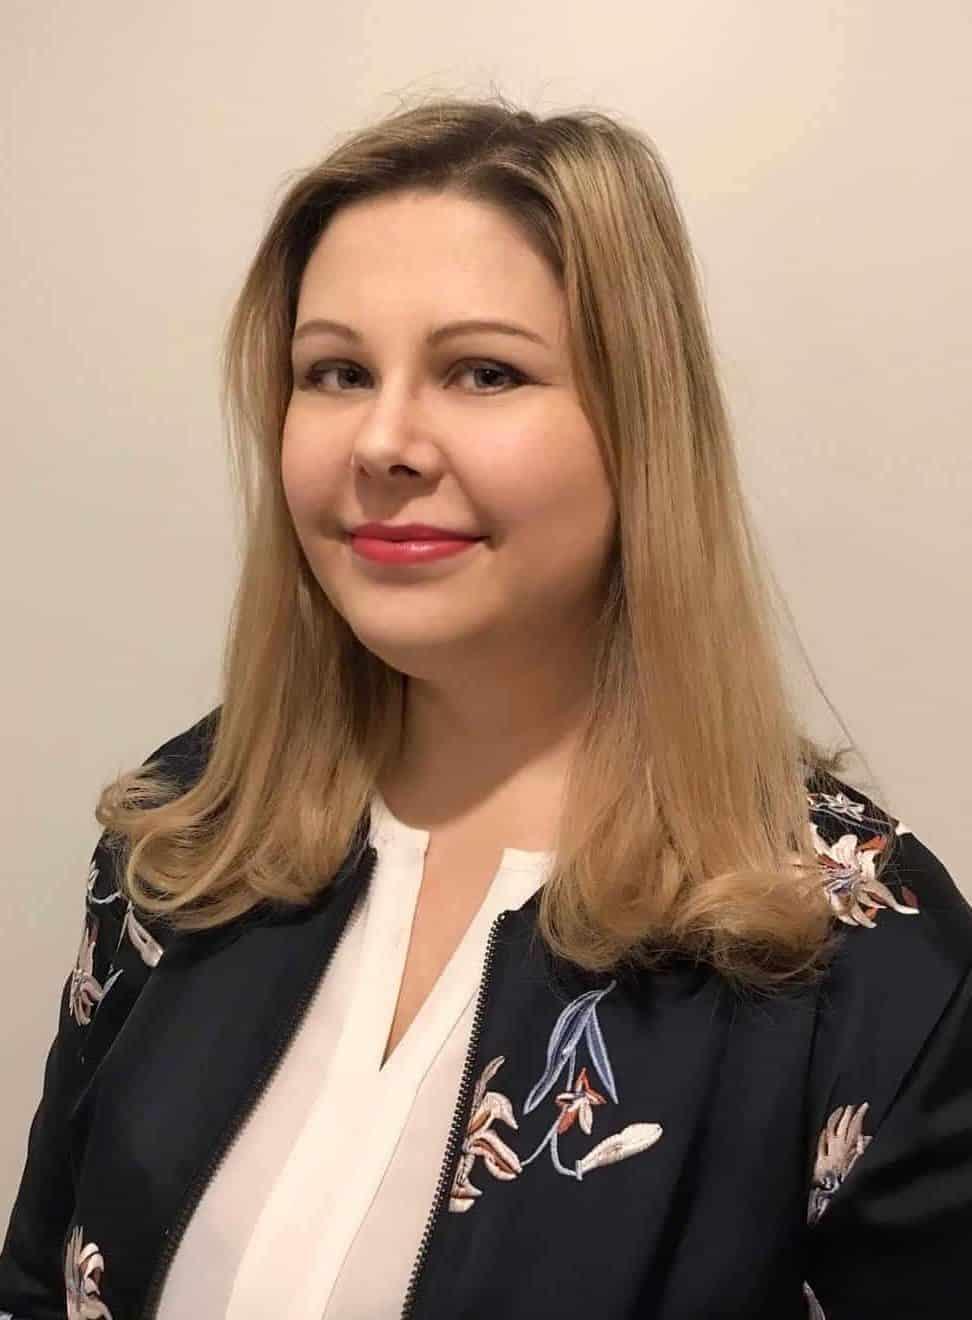 Johanna Kivistö Lex Gaudius